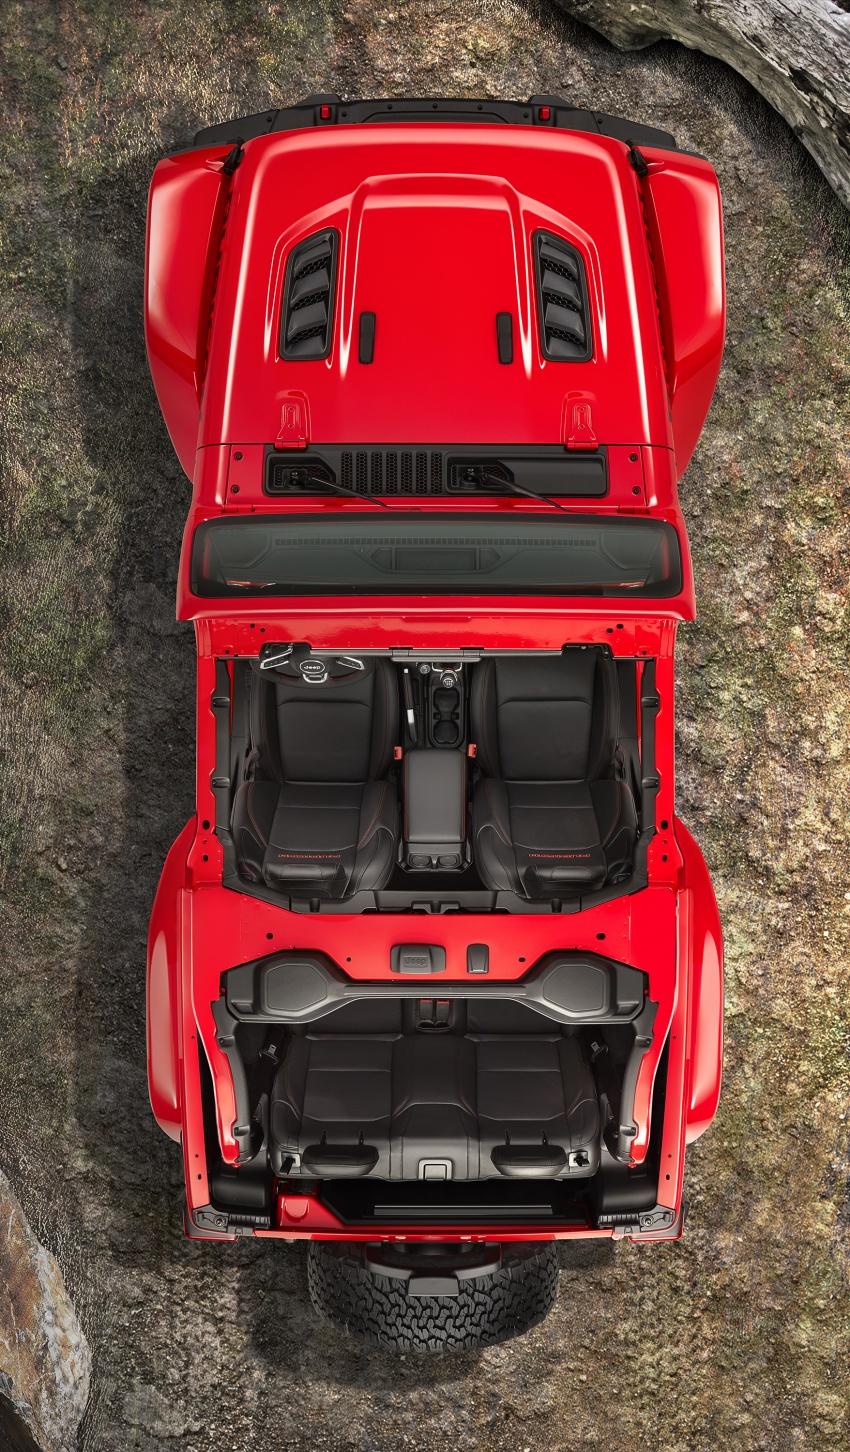 2018 Jeep Wrangler gains new hybrid turbo engine Image #748366